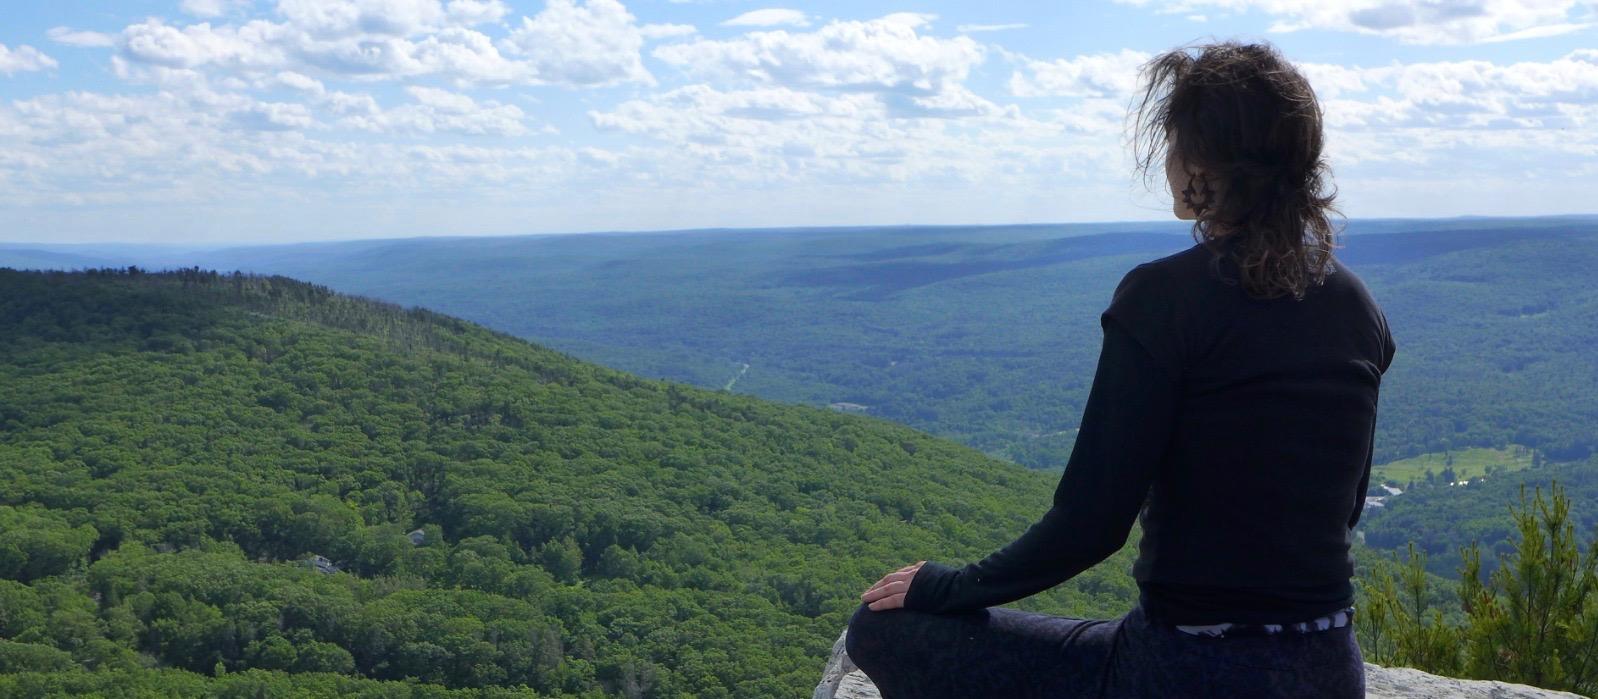 Girl meditating on a mountaintop